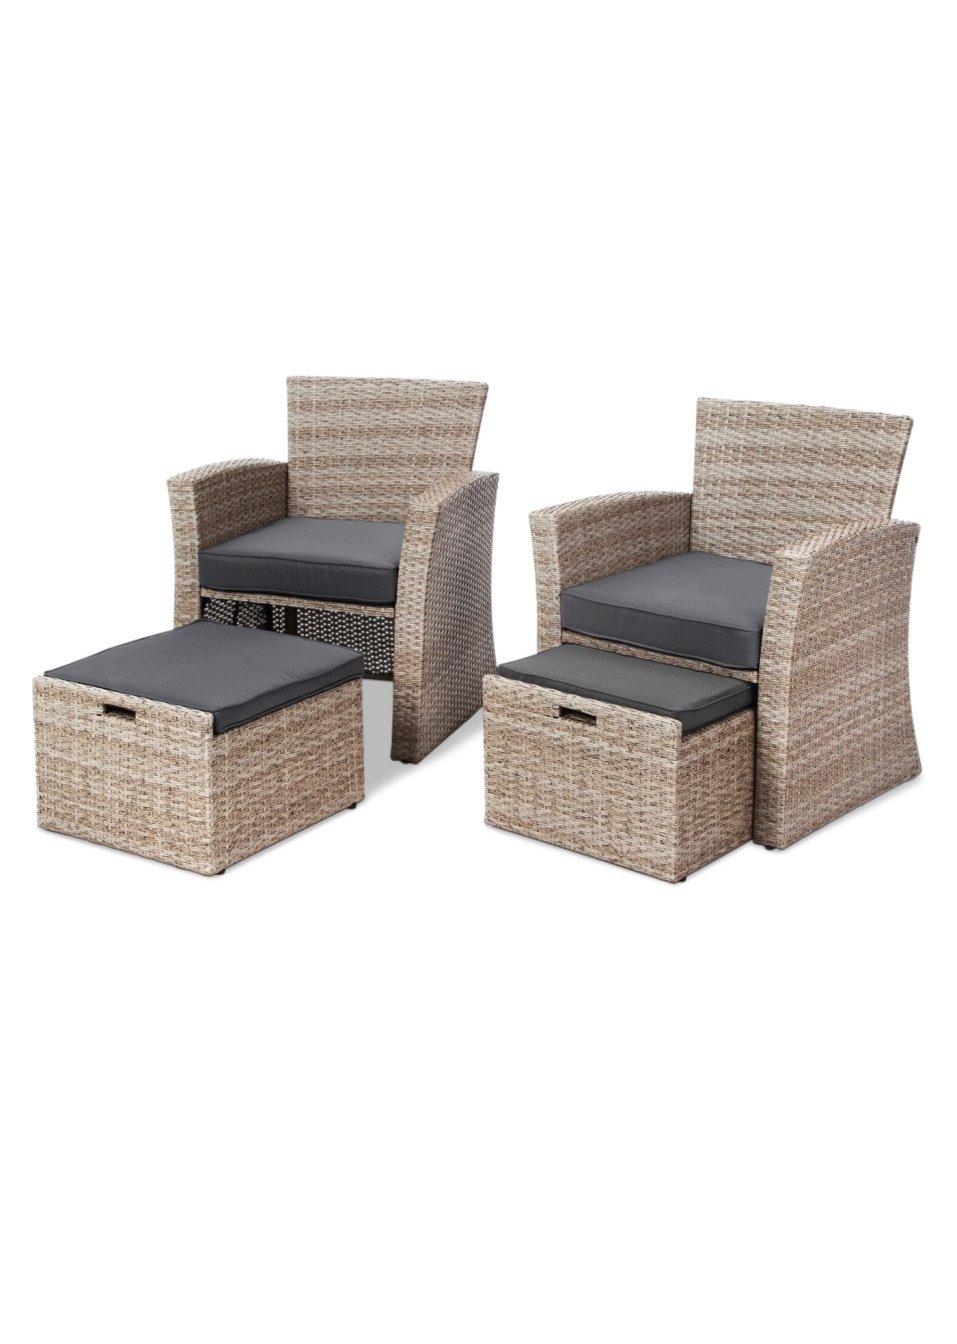 platzsparend gestaltet das gartenm bel set kailua natur. Black Bedroom Furniture Sets. Home Design Ideas